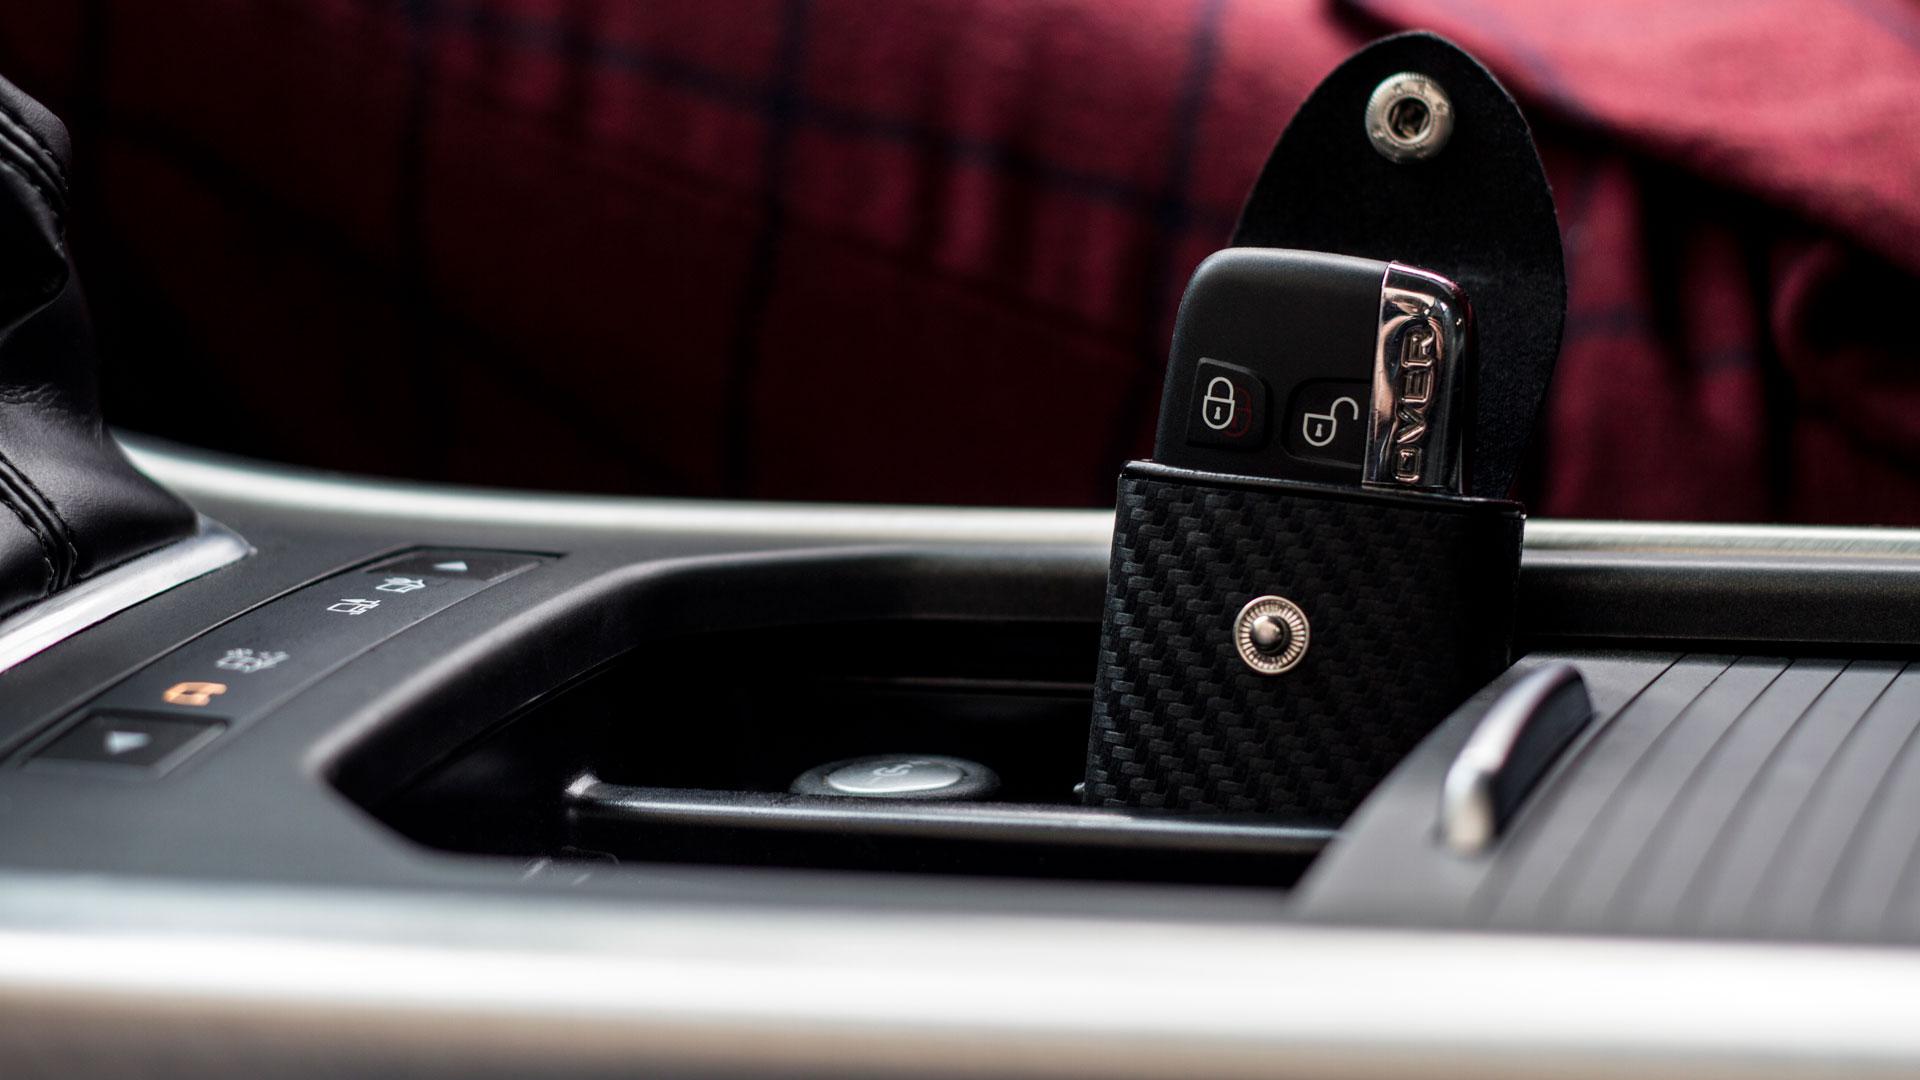 KeyBlock in car